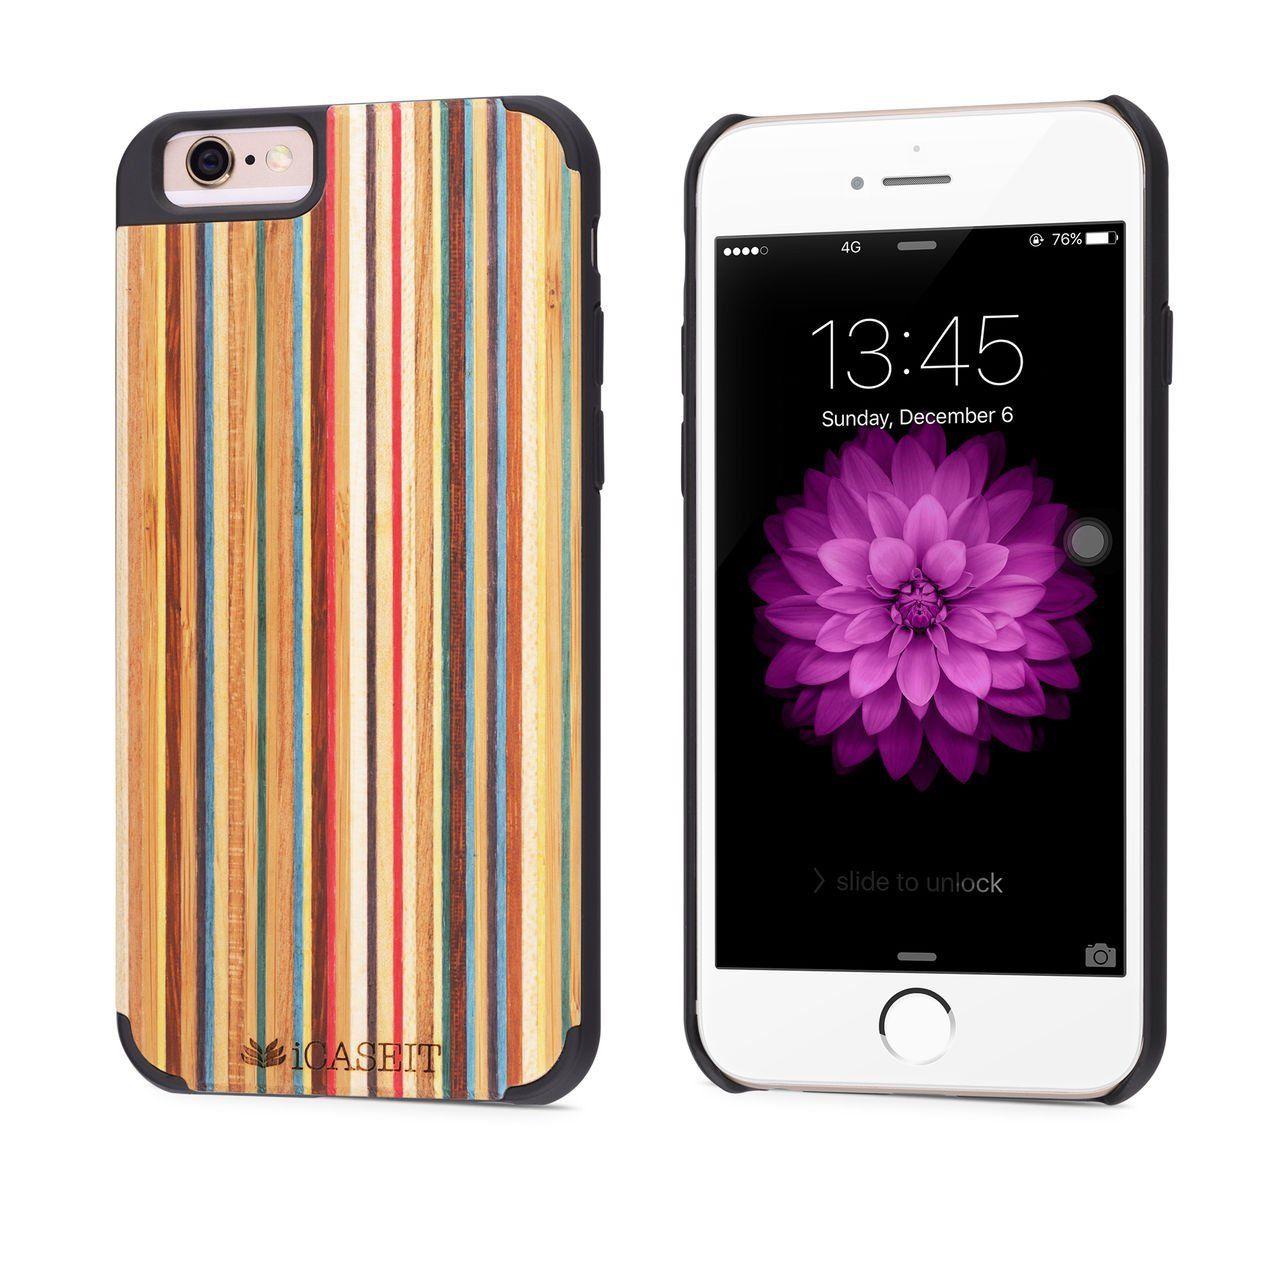 best cheap 02c40 d397e Amazon.co.uk: iPhone 6 / 6s Case | iCASEIT Handmade Premium Quality ...